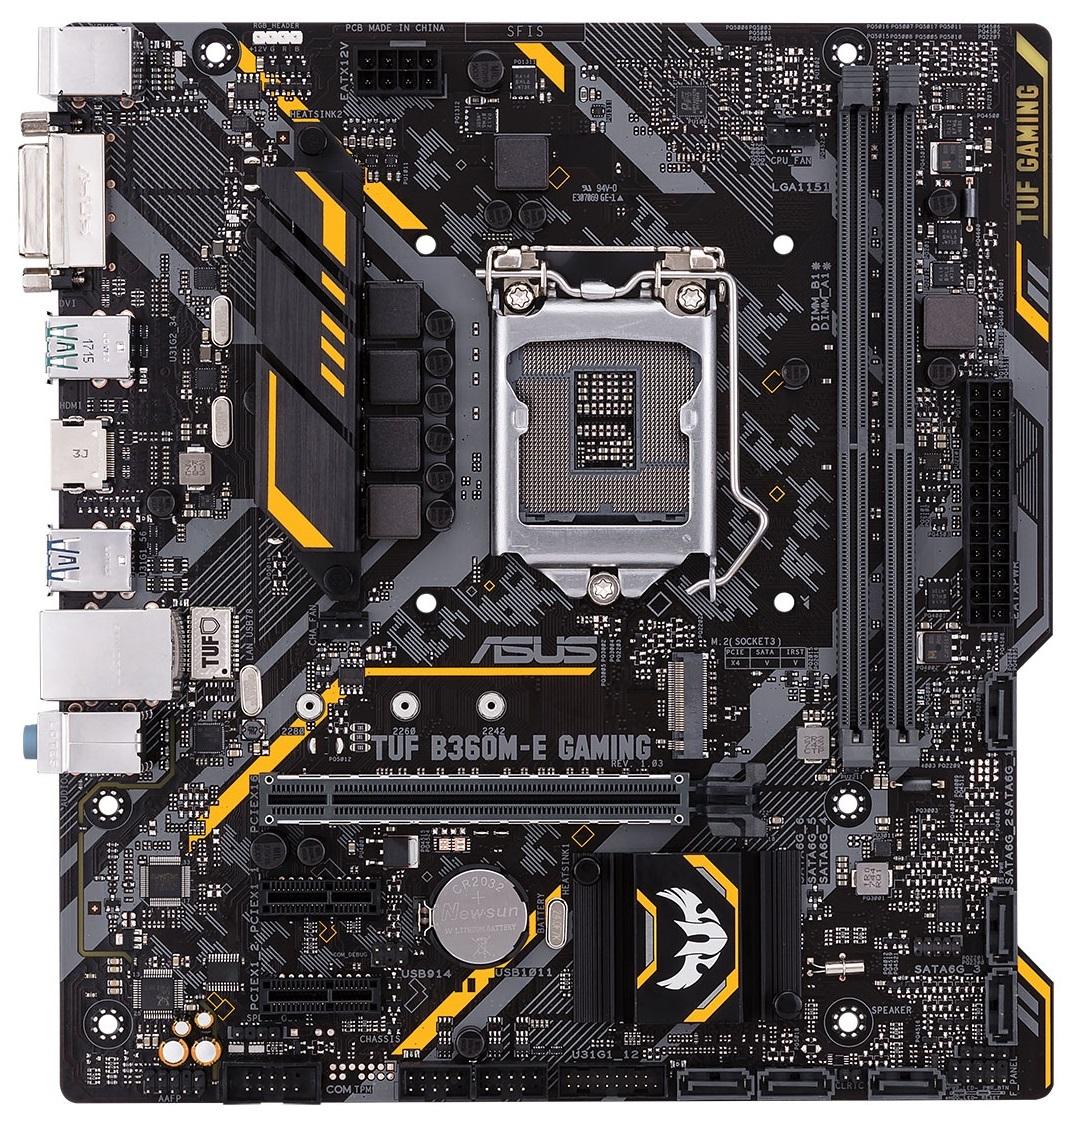 ASUS TUF B360M-E GAMING Motherboard image